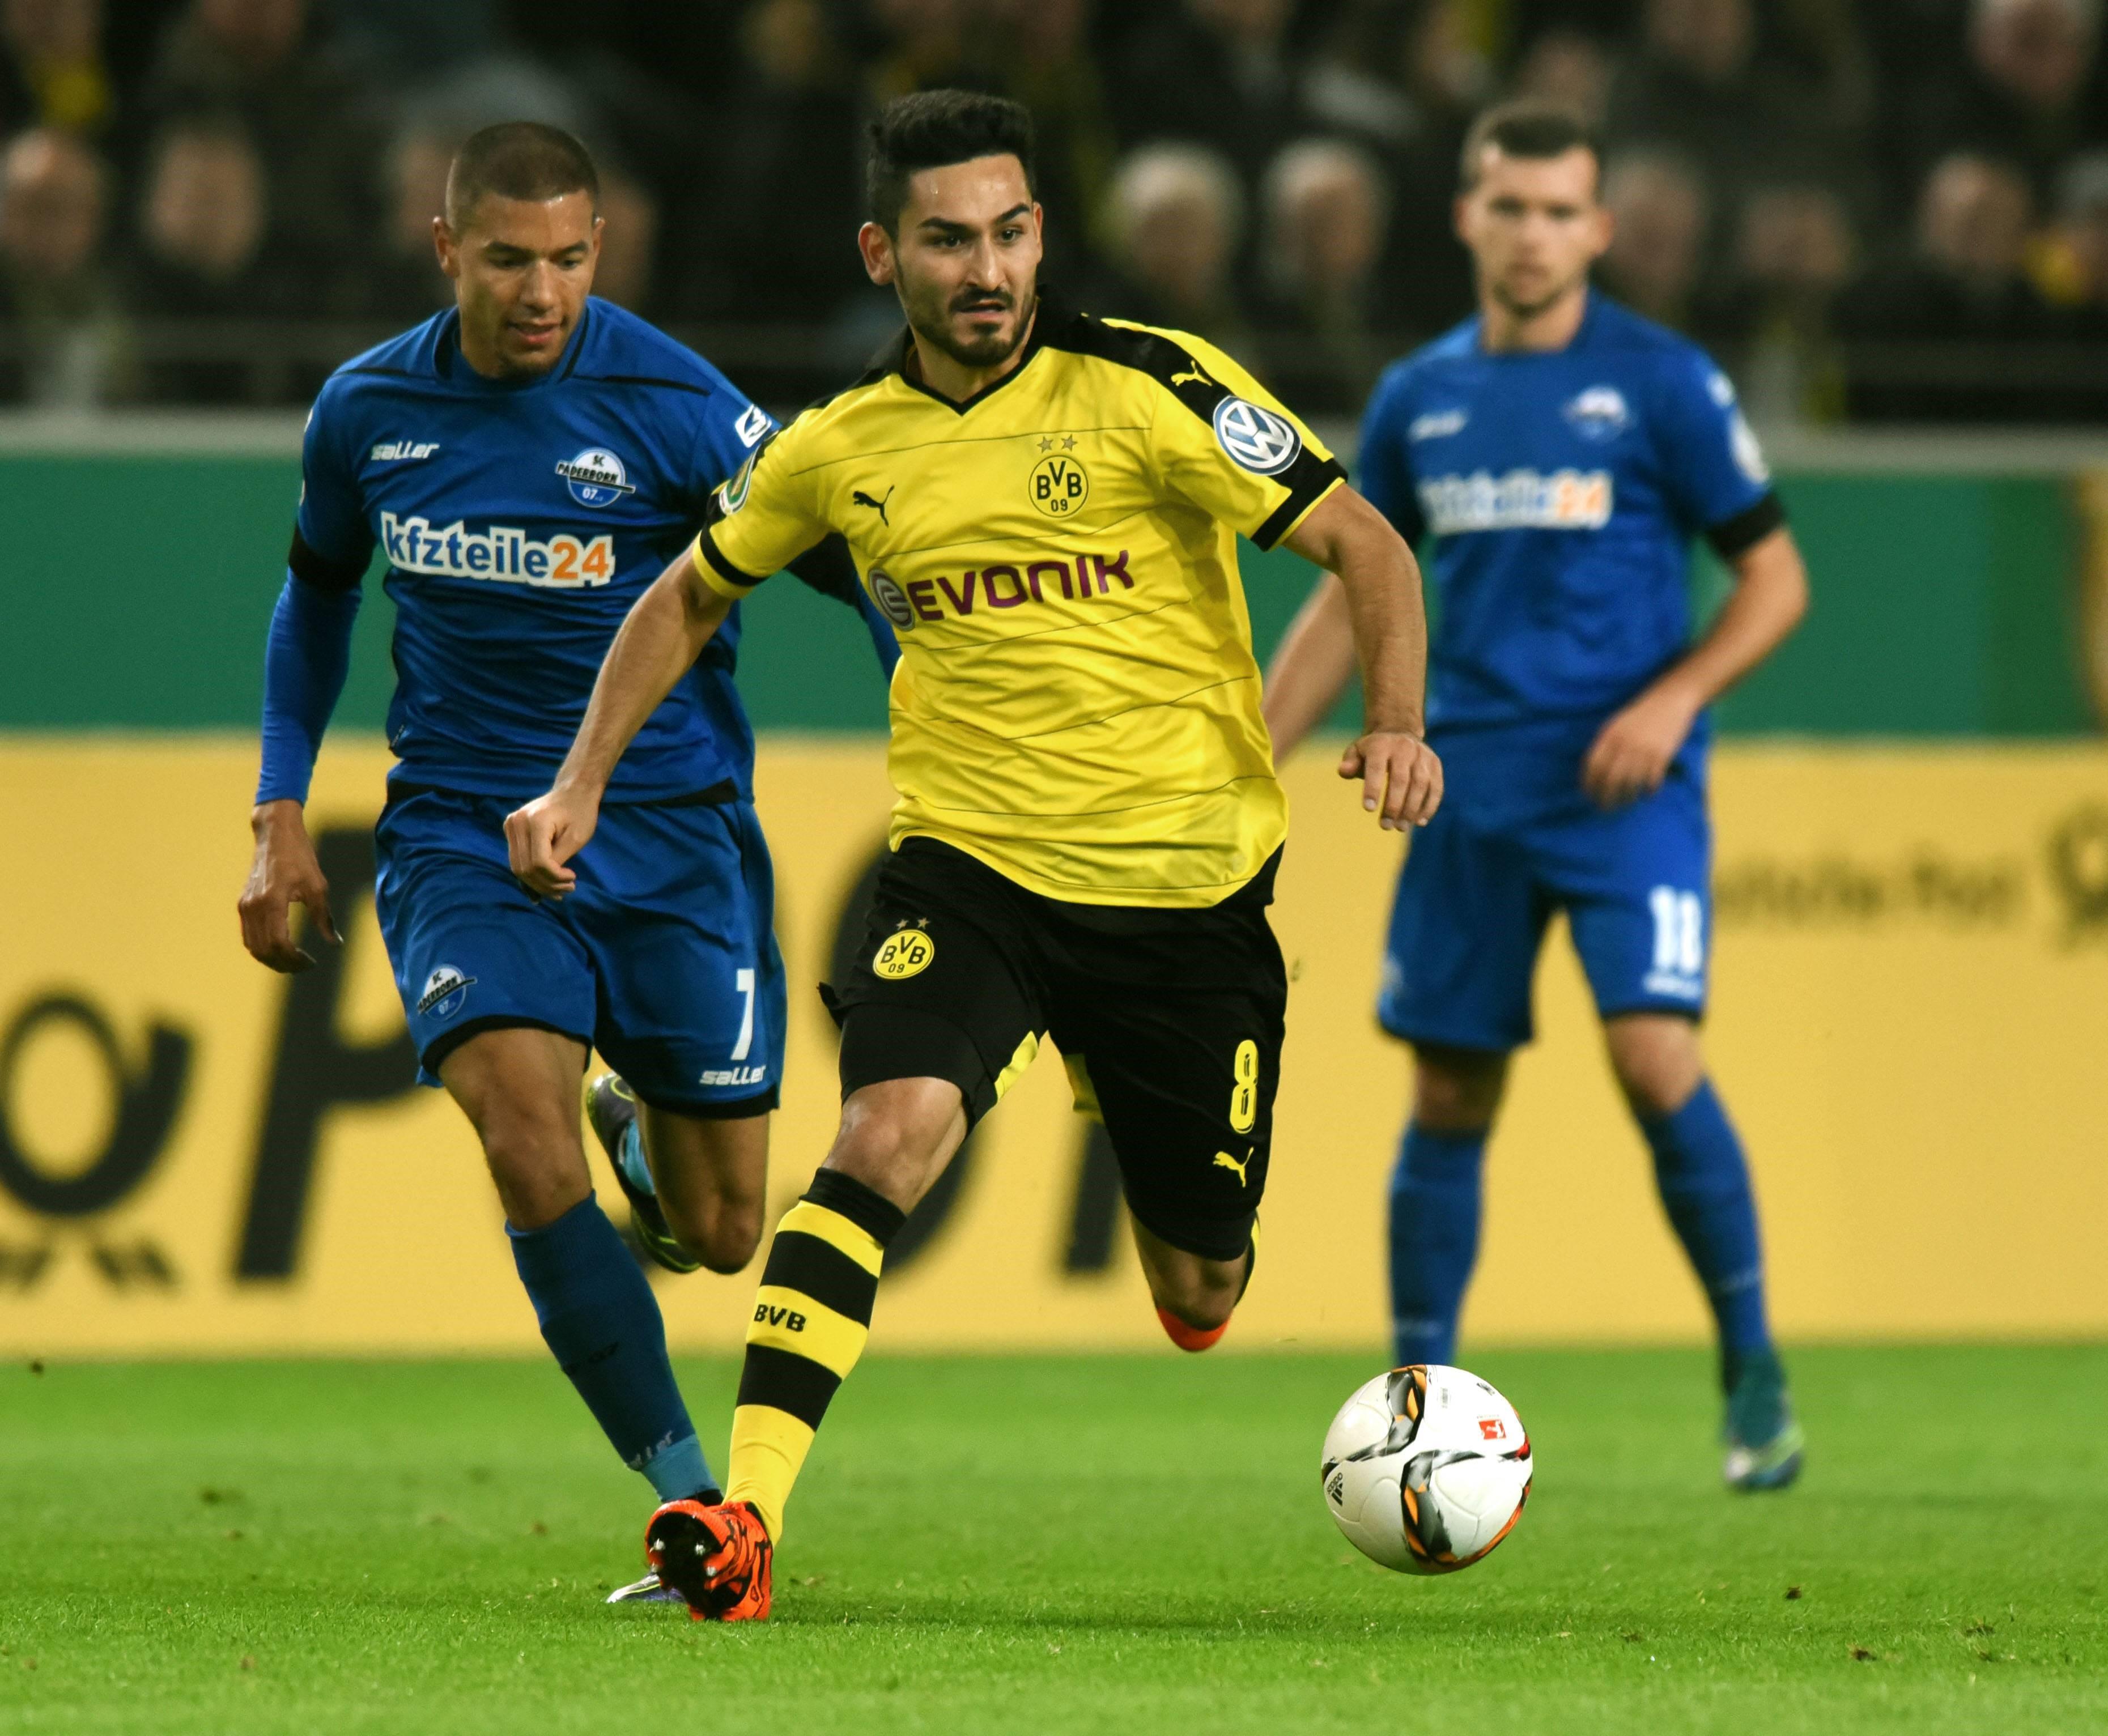 Ilkay Gundogan (Dortmund) en Coupe d'Allemagne 2015-2016